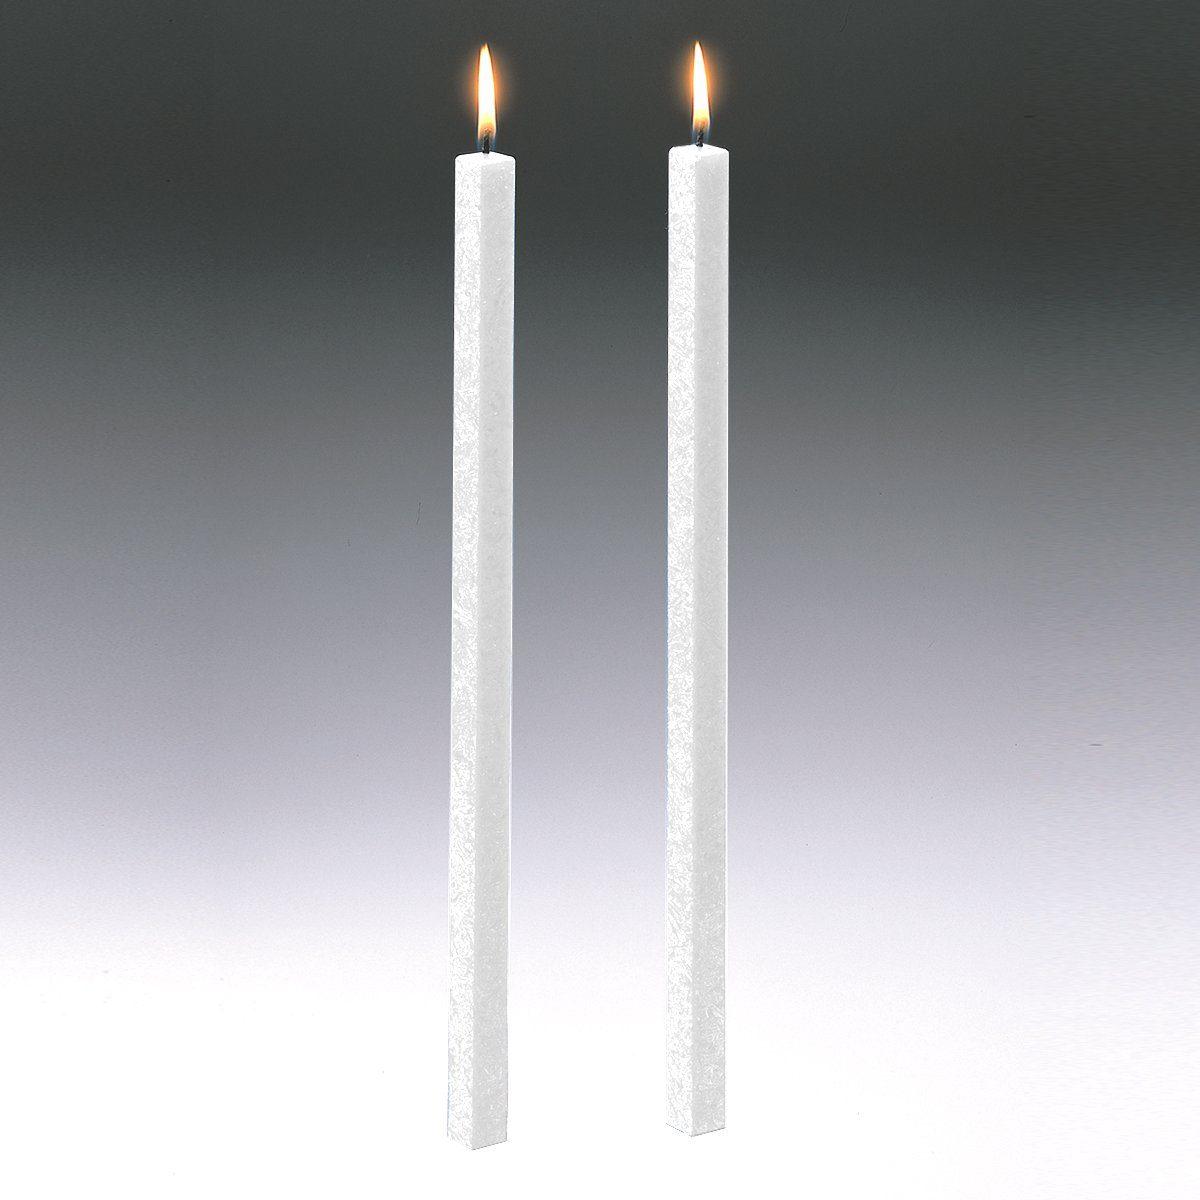 Amabiente Amabiente Kerze CLASSIC weiß 40cm - 2er Set